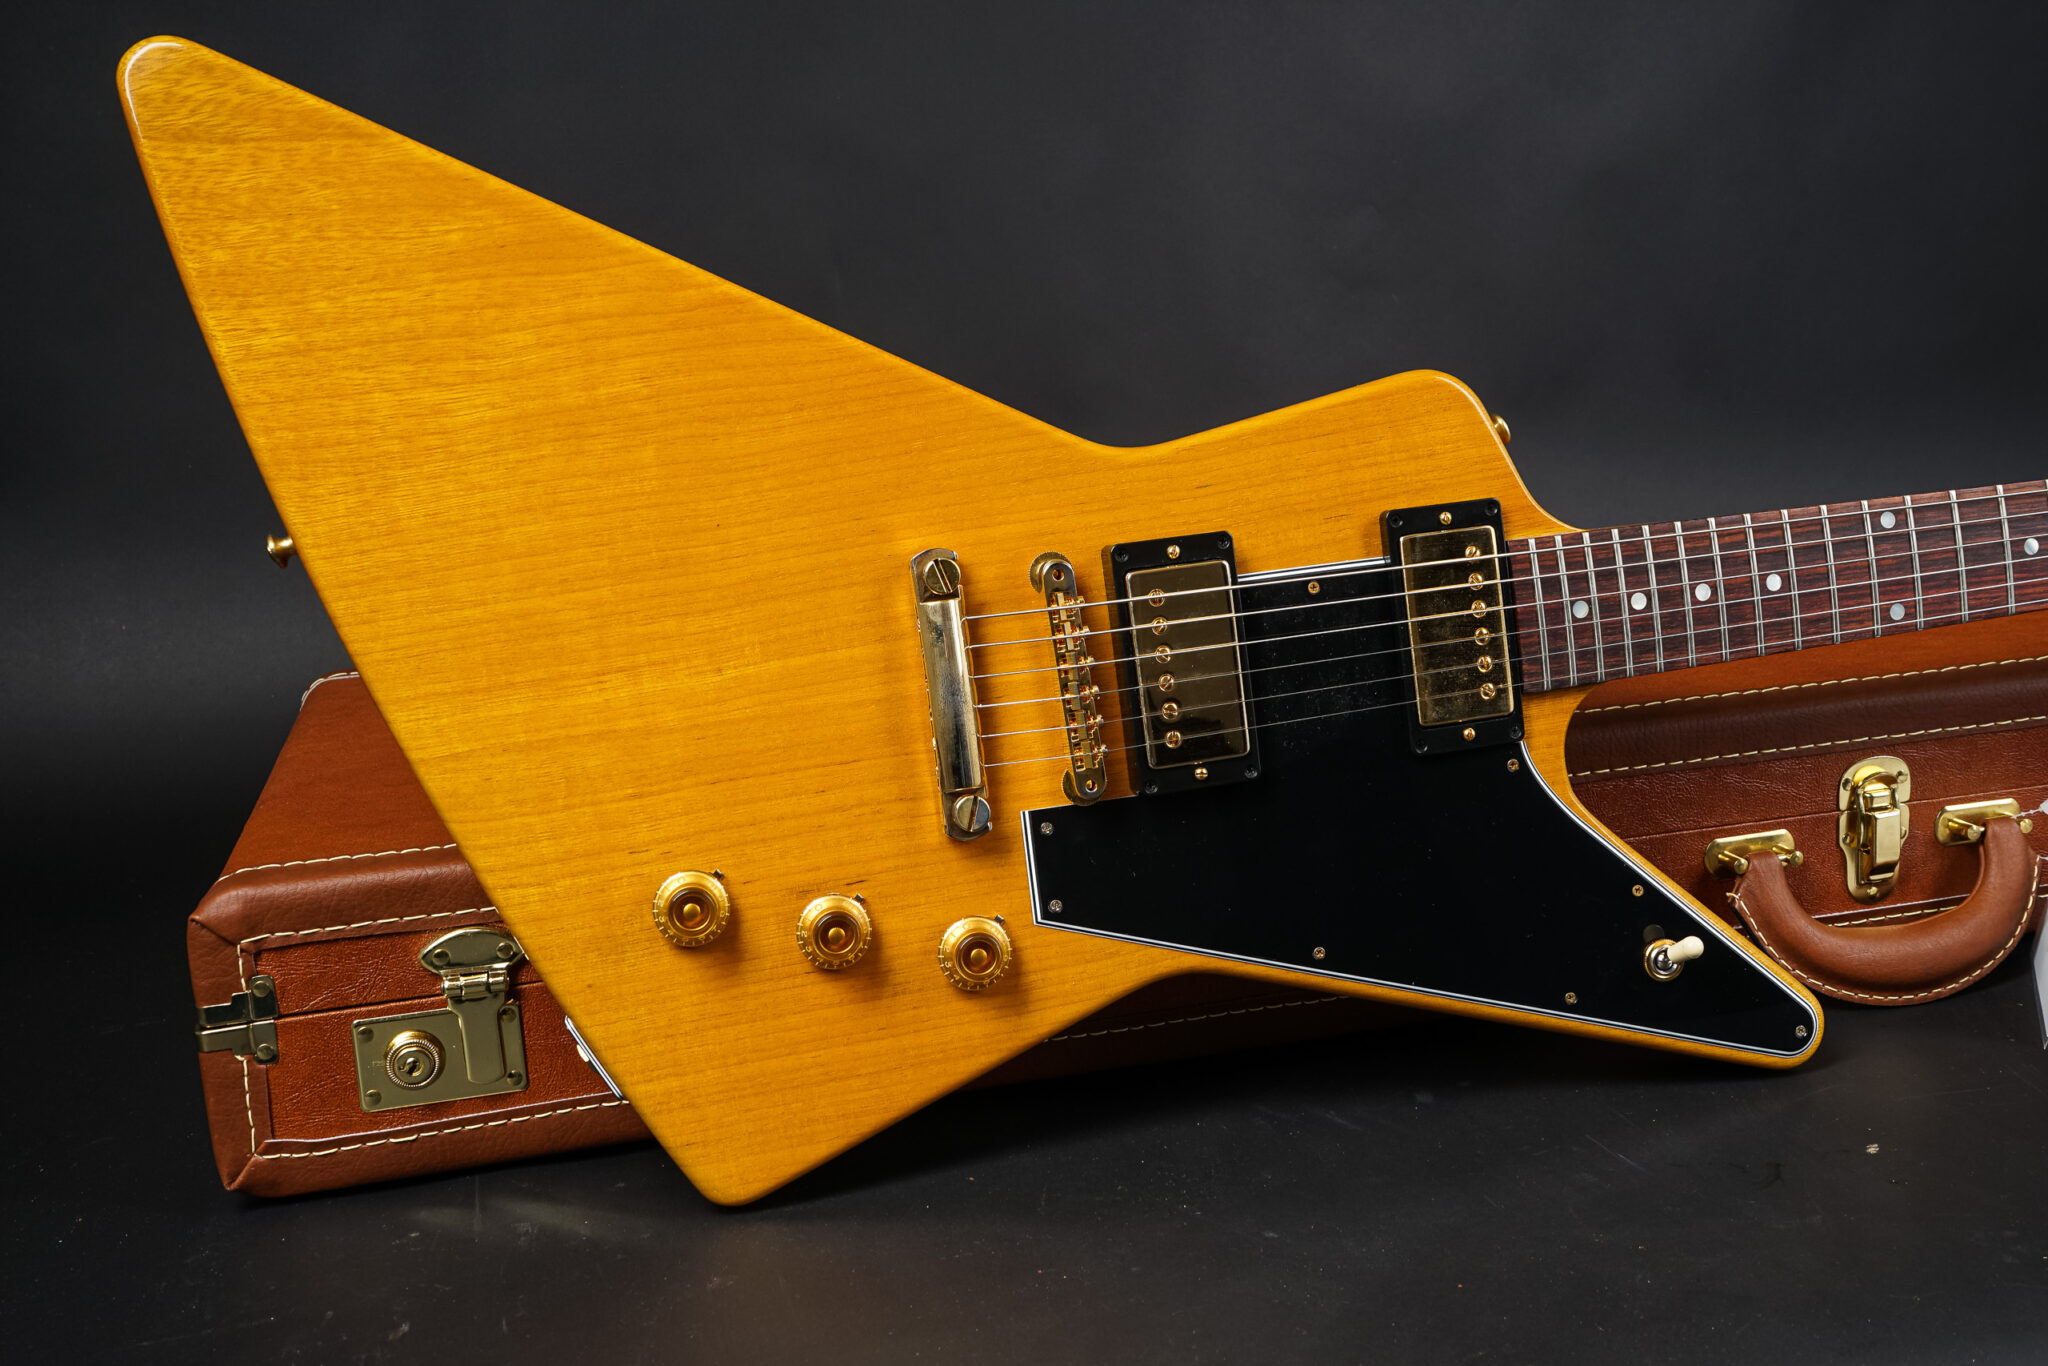 https://guitarpoint.de/app/uploads/products/gibson-custom-shop-korina-1958-explorer-reissue-black-pickguard-vos-81986/Gibson-Custom-Shop-1958-Explorer-Korina-Reissue-Black-Pickguard-81986-2-2048x1366.jpg